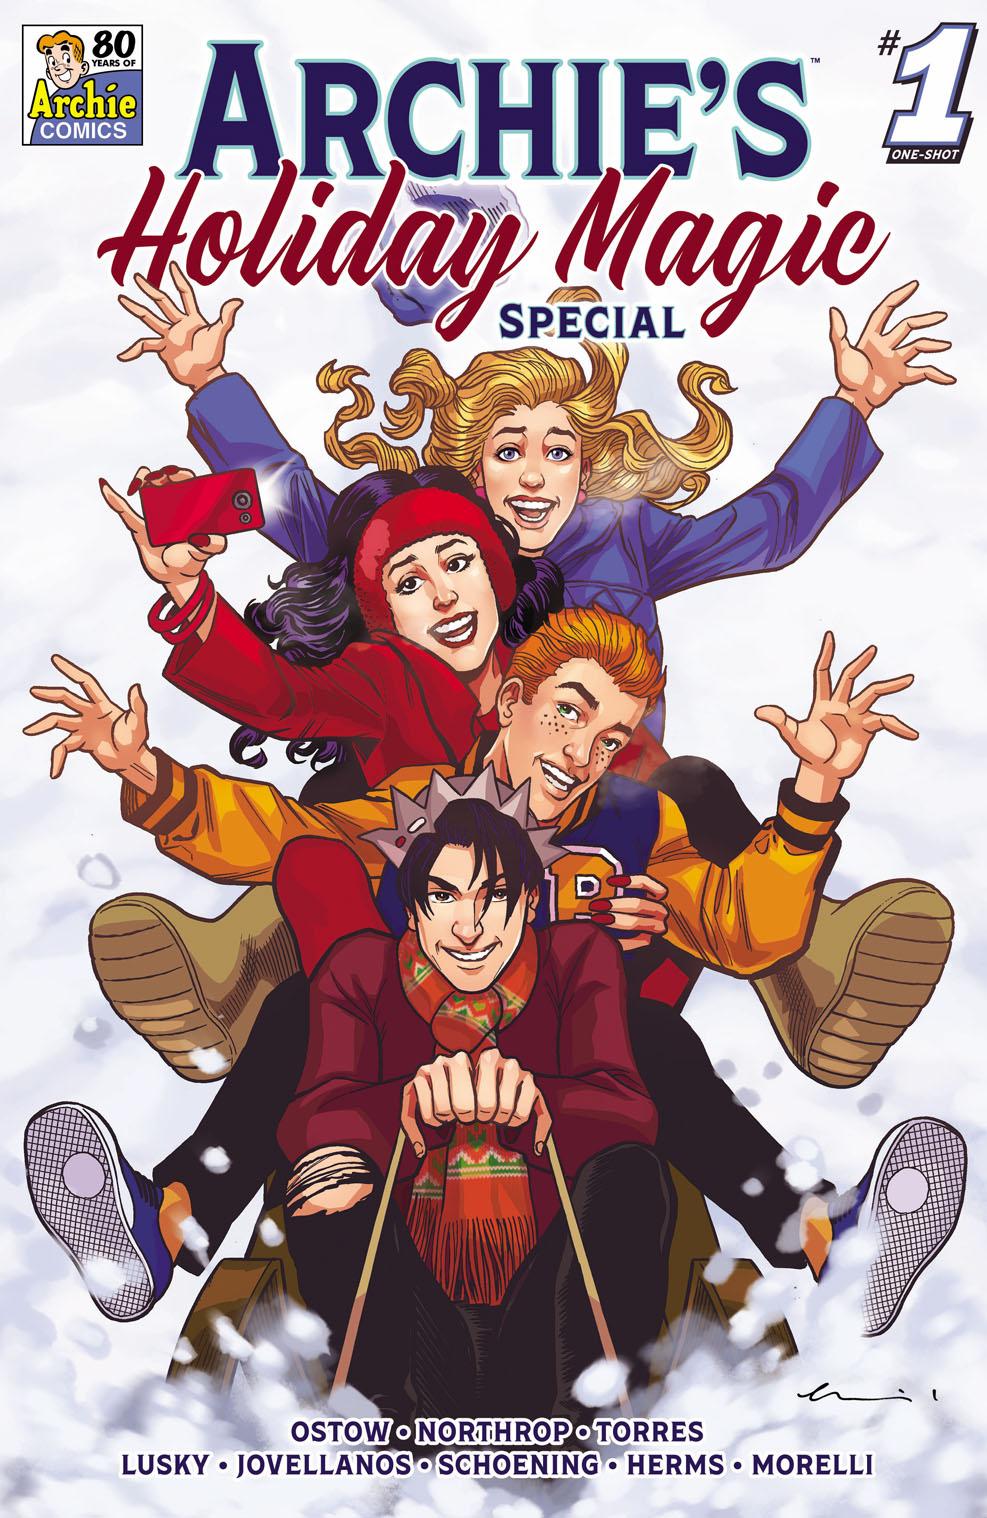 ArchiesHolidayMagicSpecialVar Archie Comic Publications December 2021 Solicitations